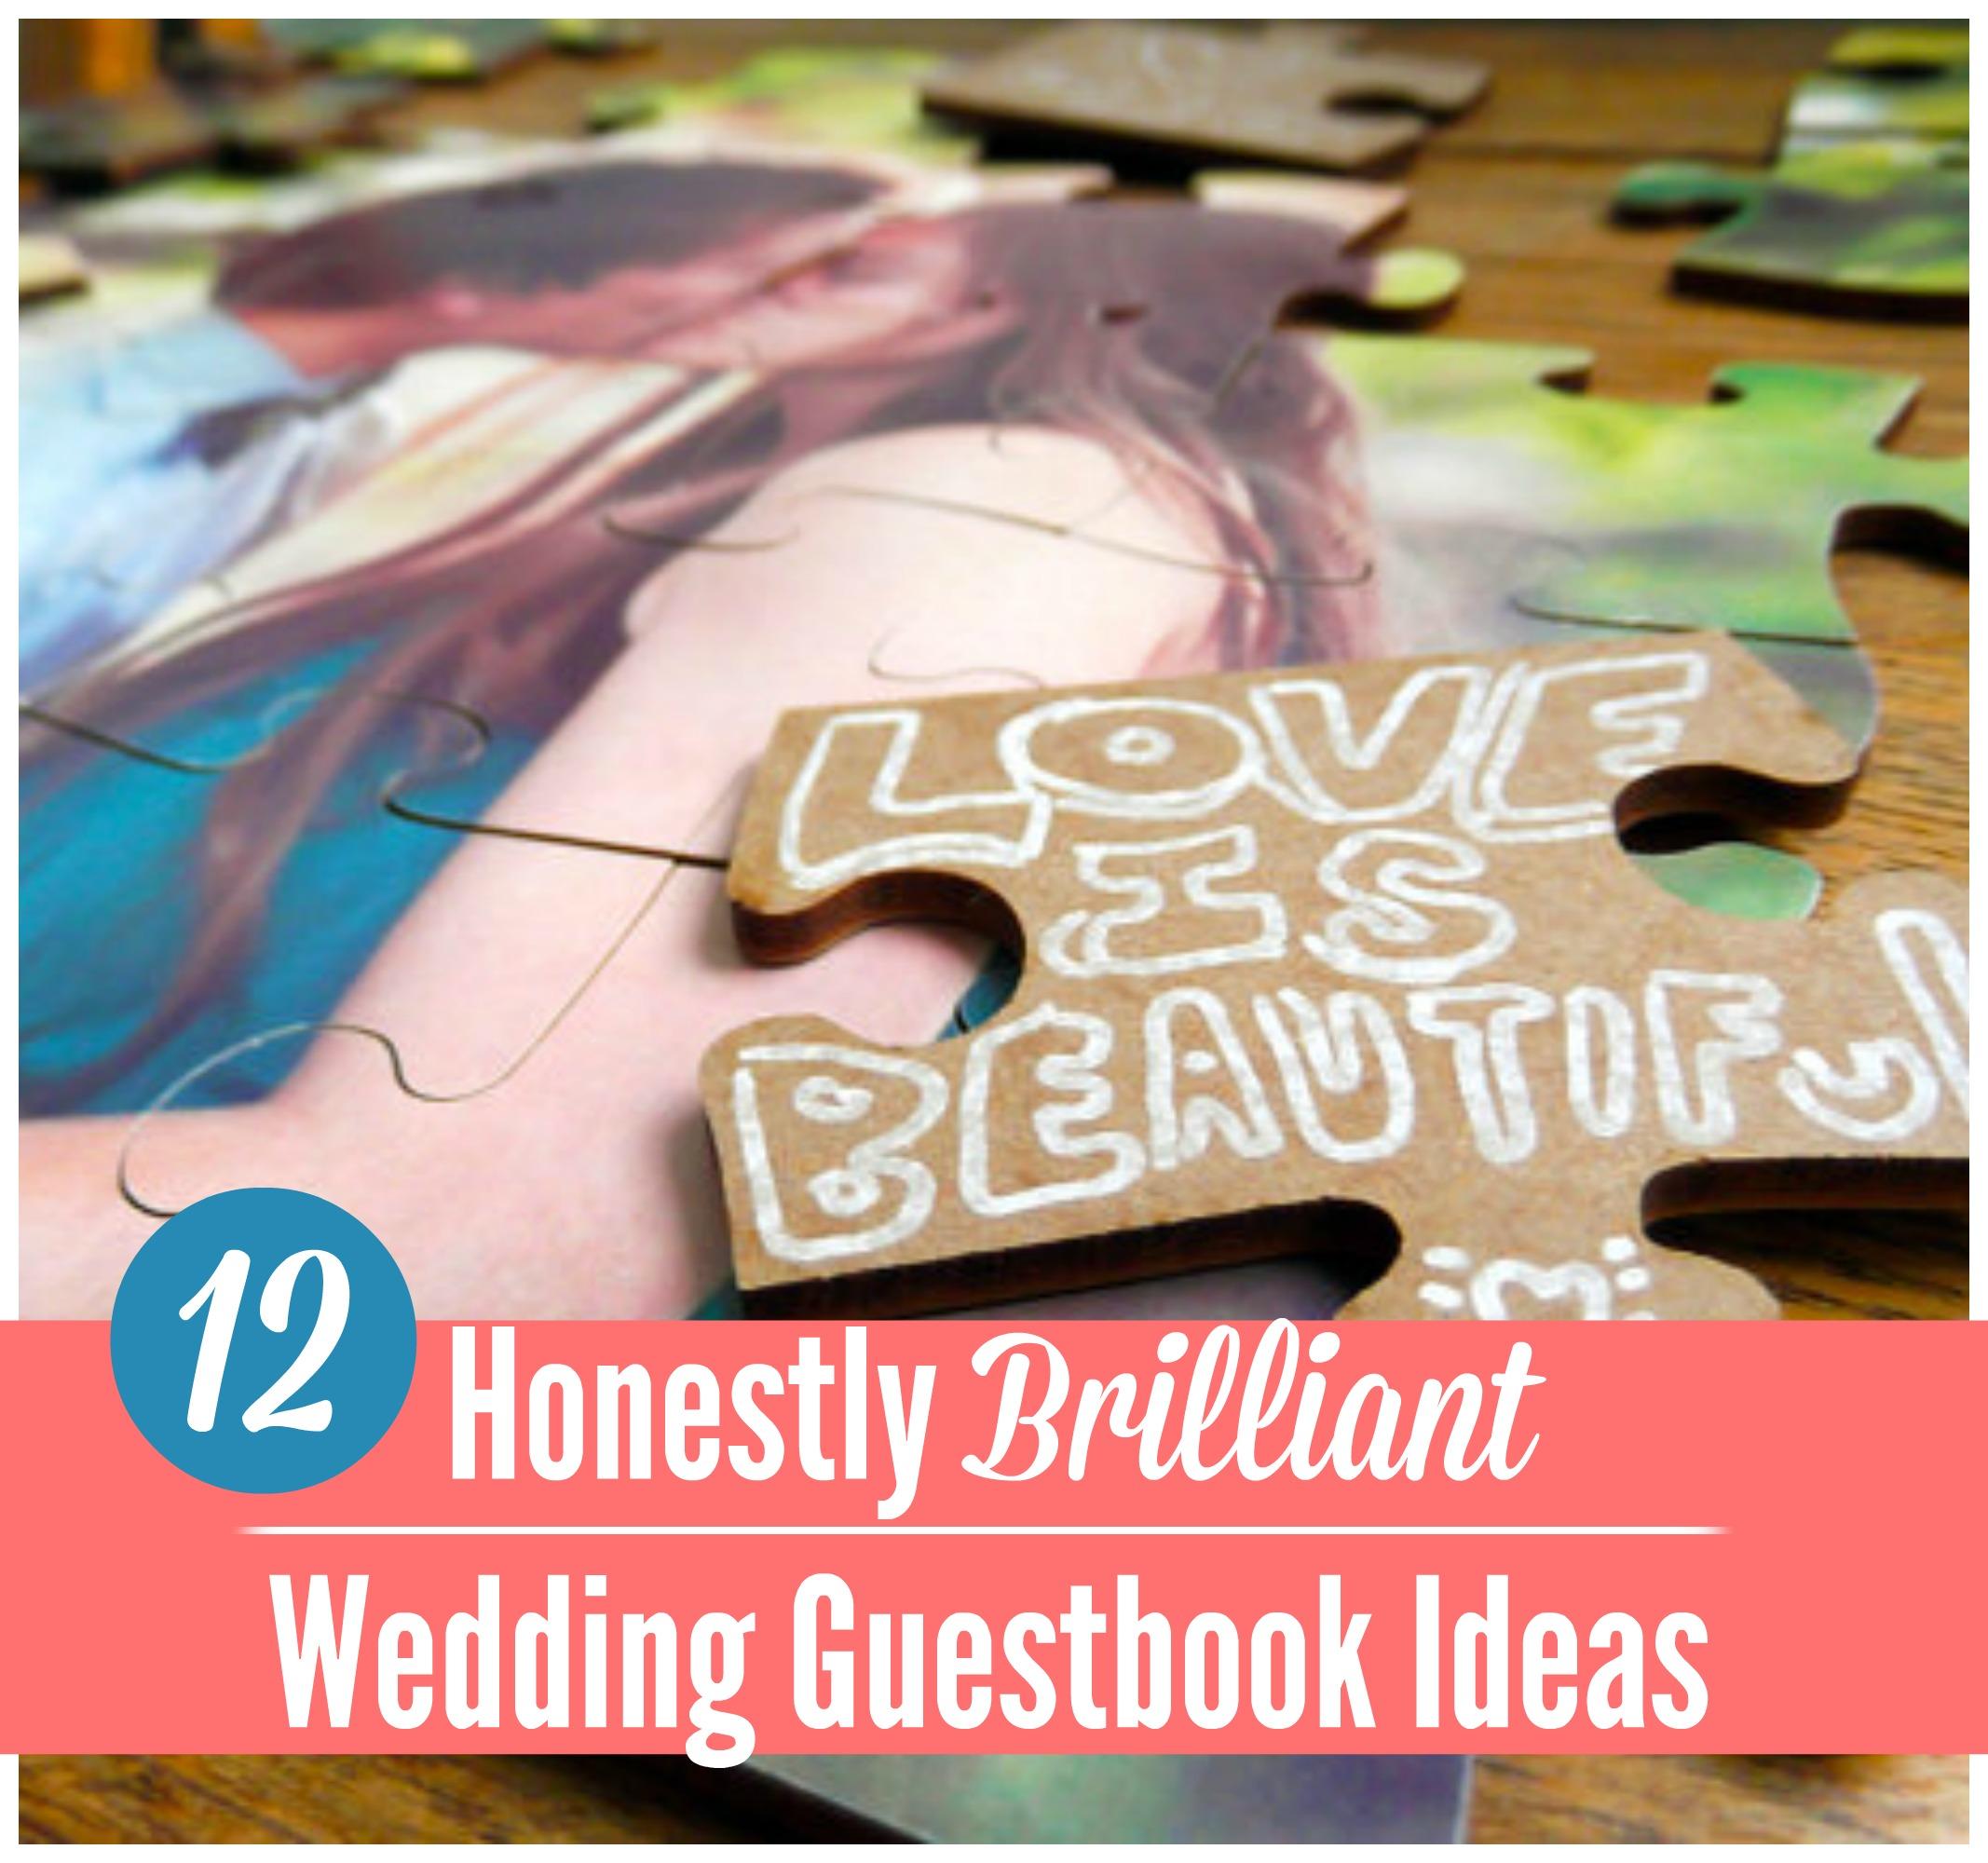 15 Insanely Unique Wedding Guest Book Ideas - Craft Paper Scissors